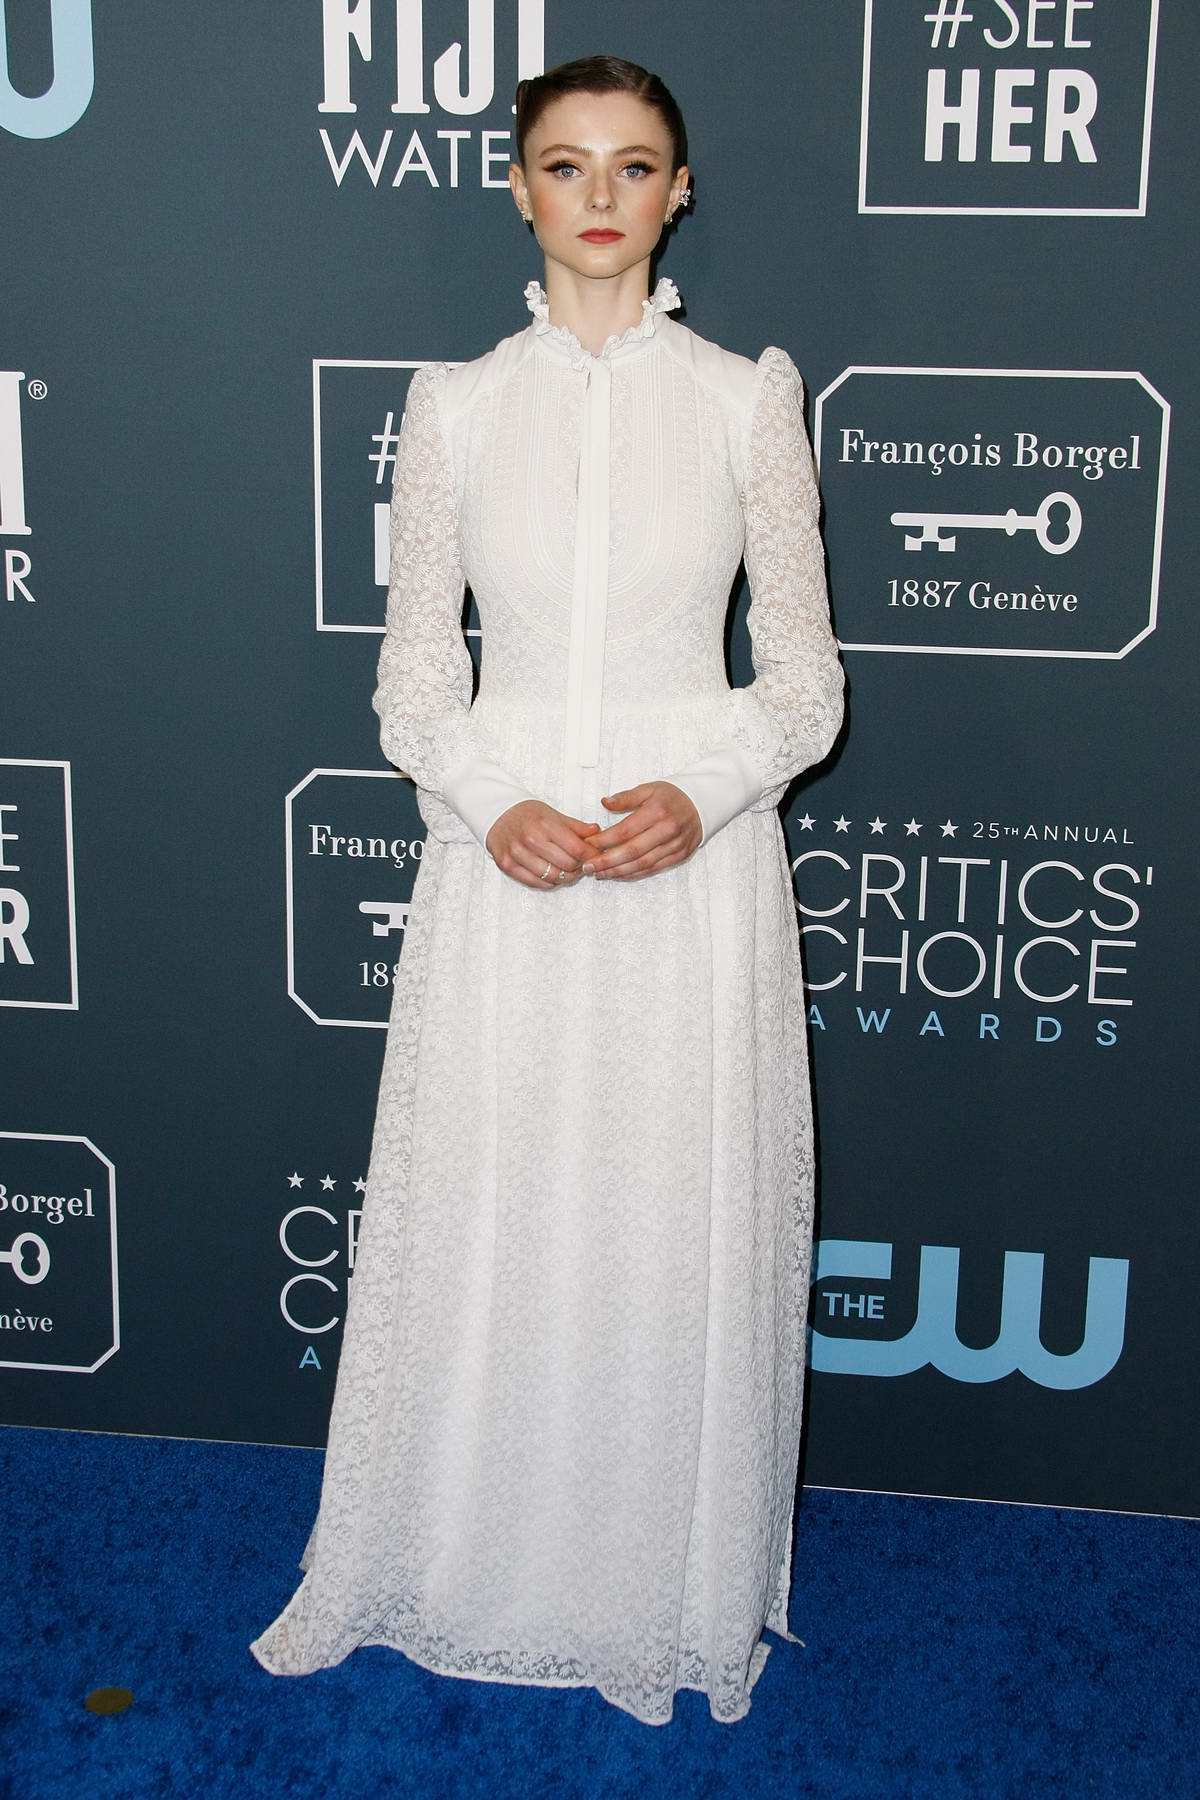 Thomasin McKenzie attends the 25th Annual Critics' Choice Awards at Barker Hangar in Santa Monica, California